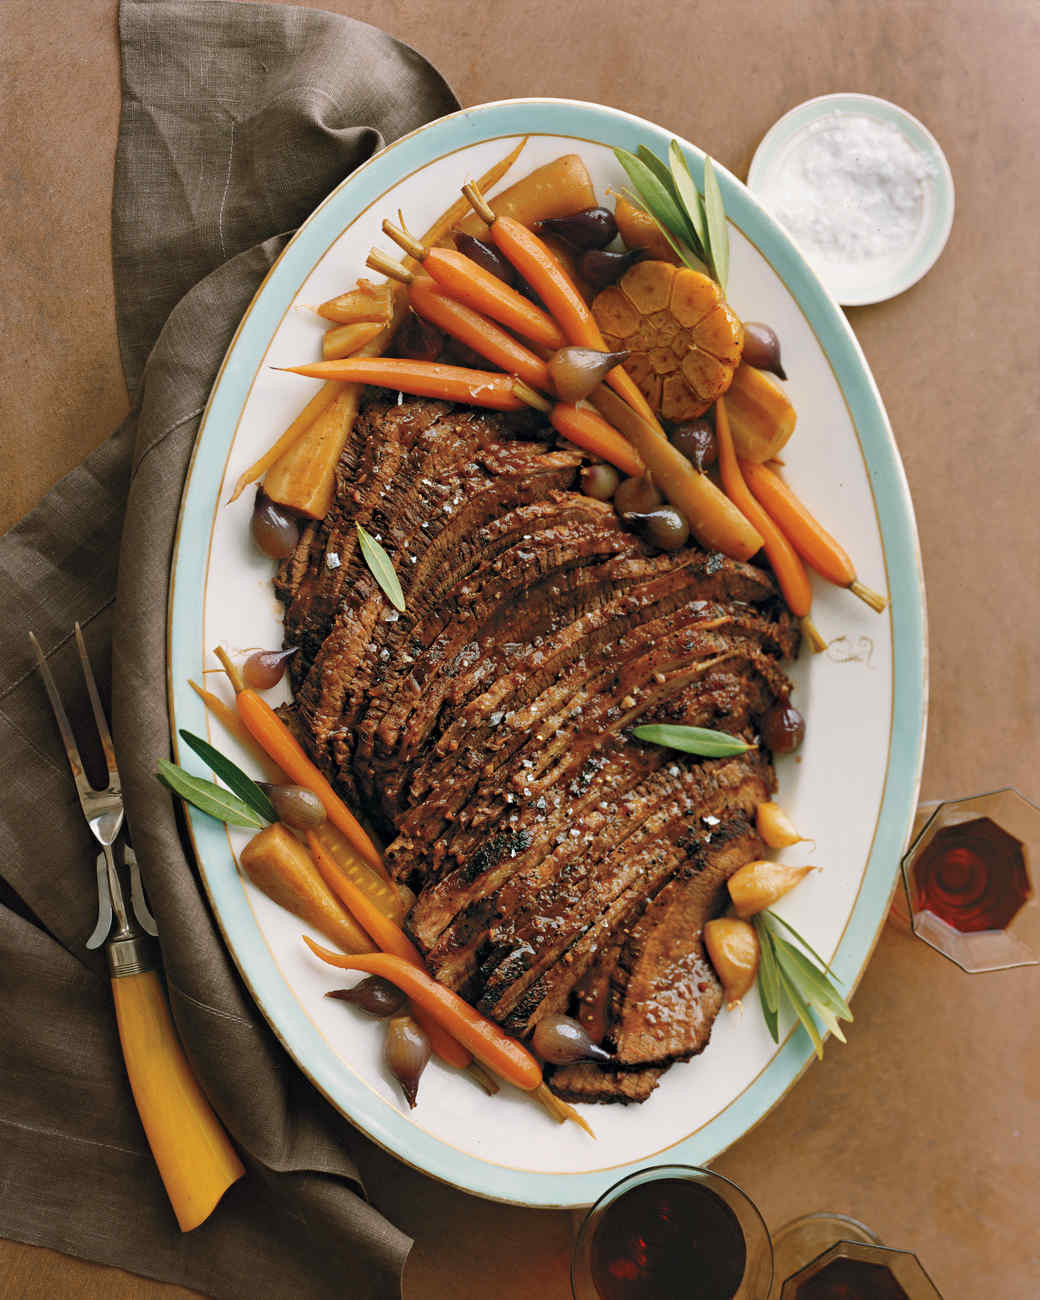 Hanukkah Dinners Recipes  Hanukkah Dinner Recipes That the Whole Family Will Love